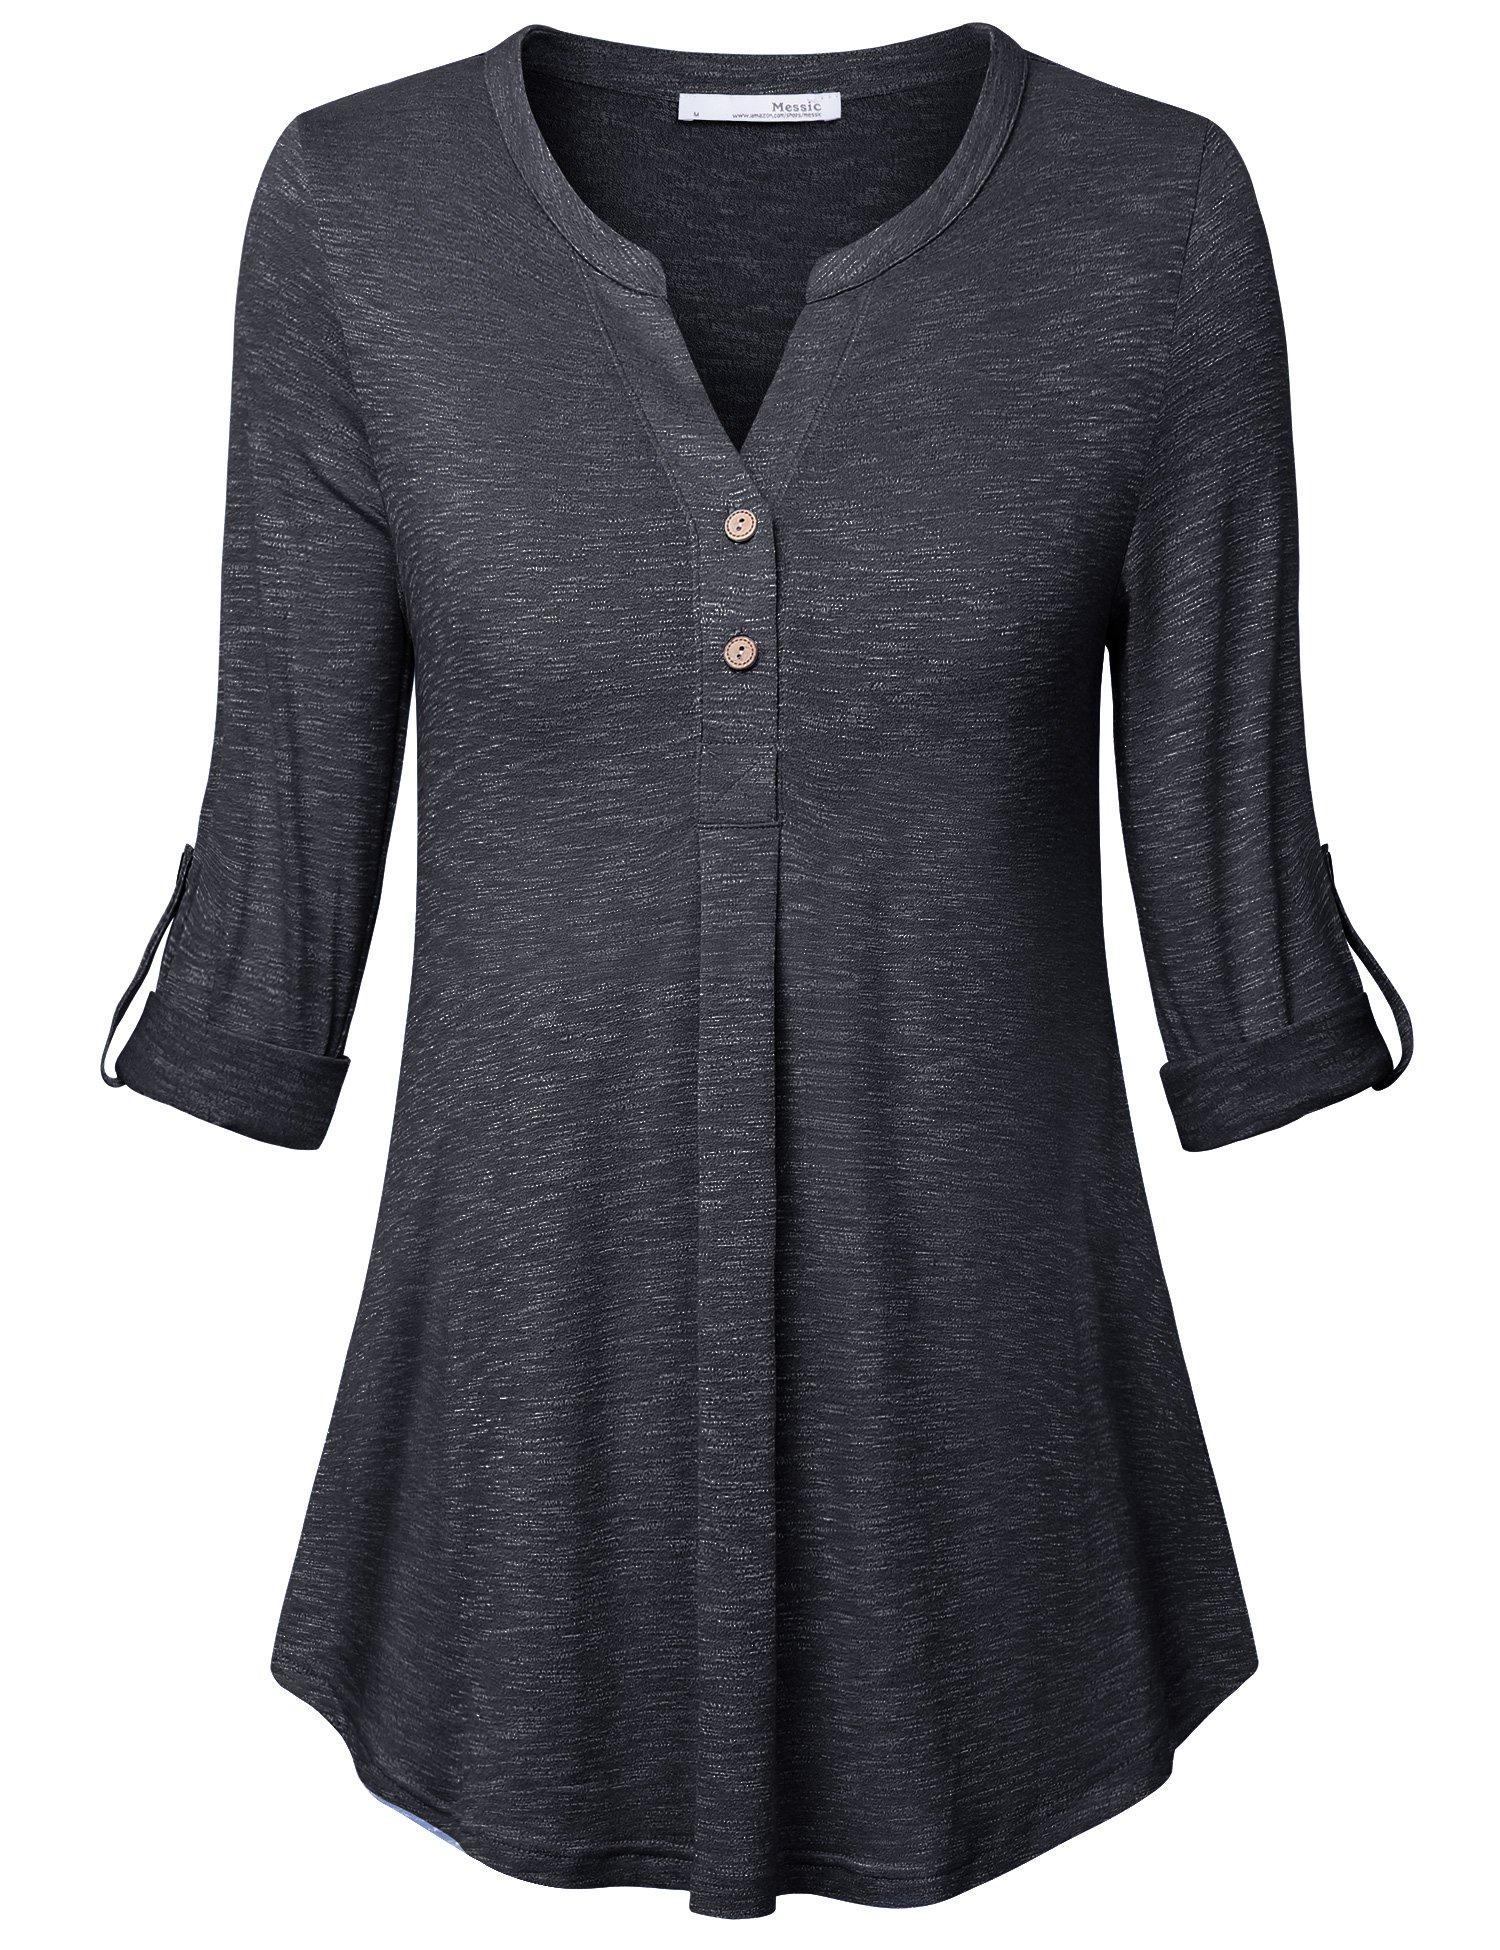 Messic Womens Tunic Tops, Joniors Casual 3/4 Sleeve Shirt Henley V Neck Clothes for Women Carbon Black,Medium